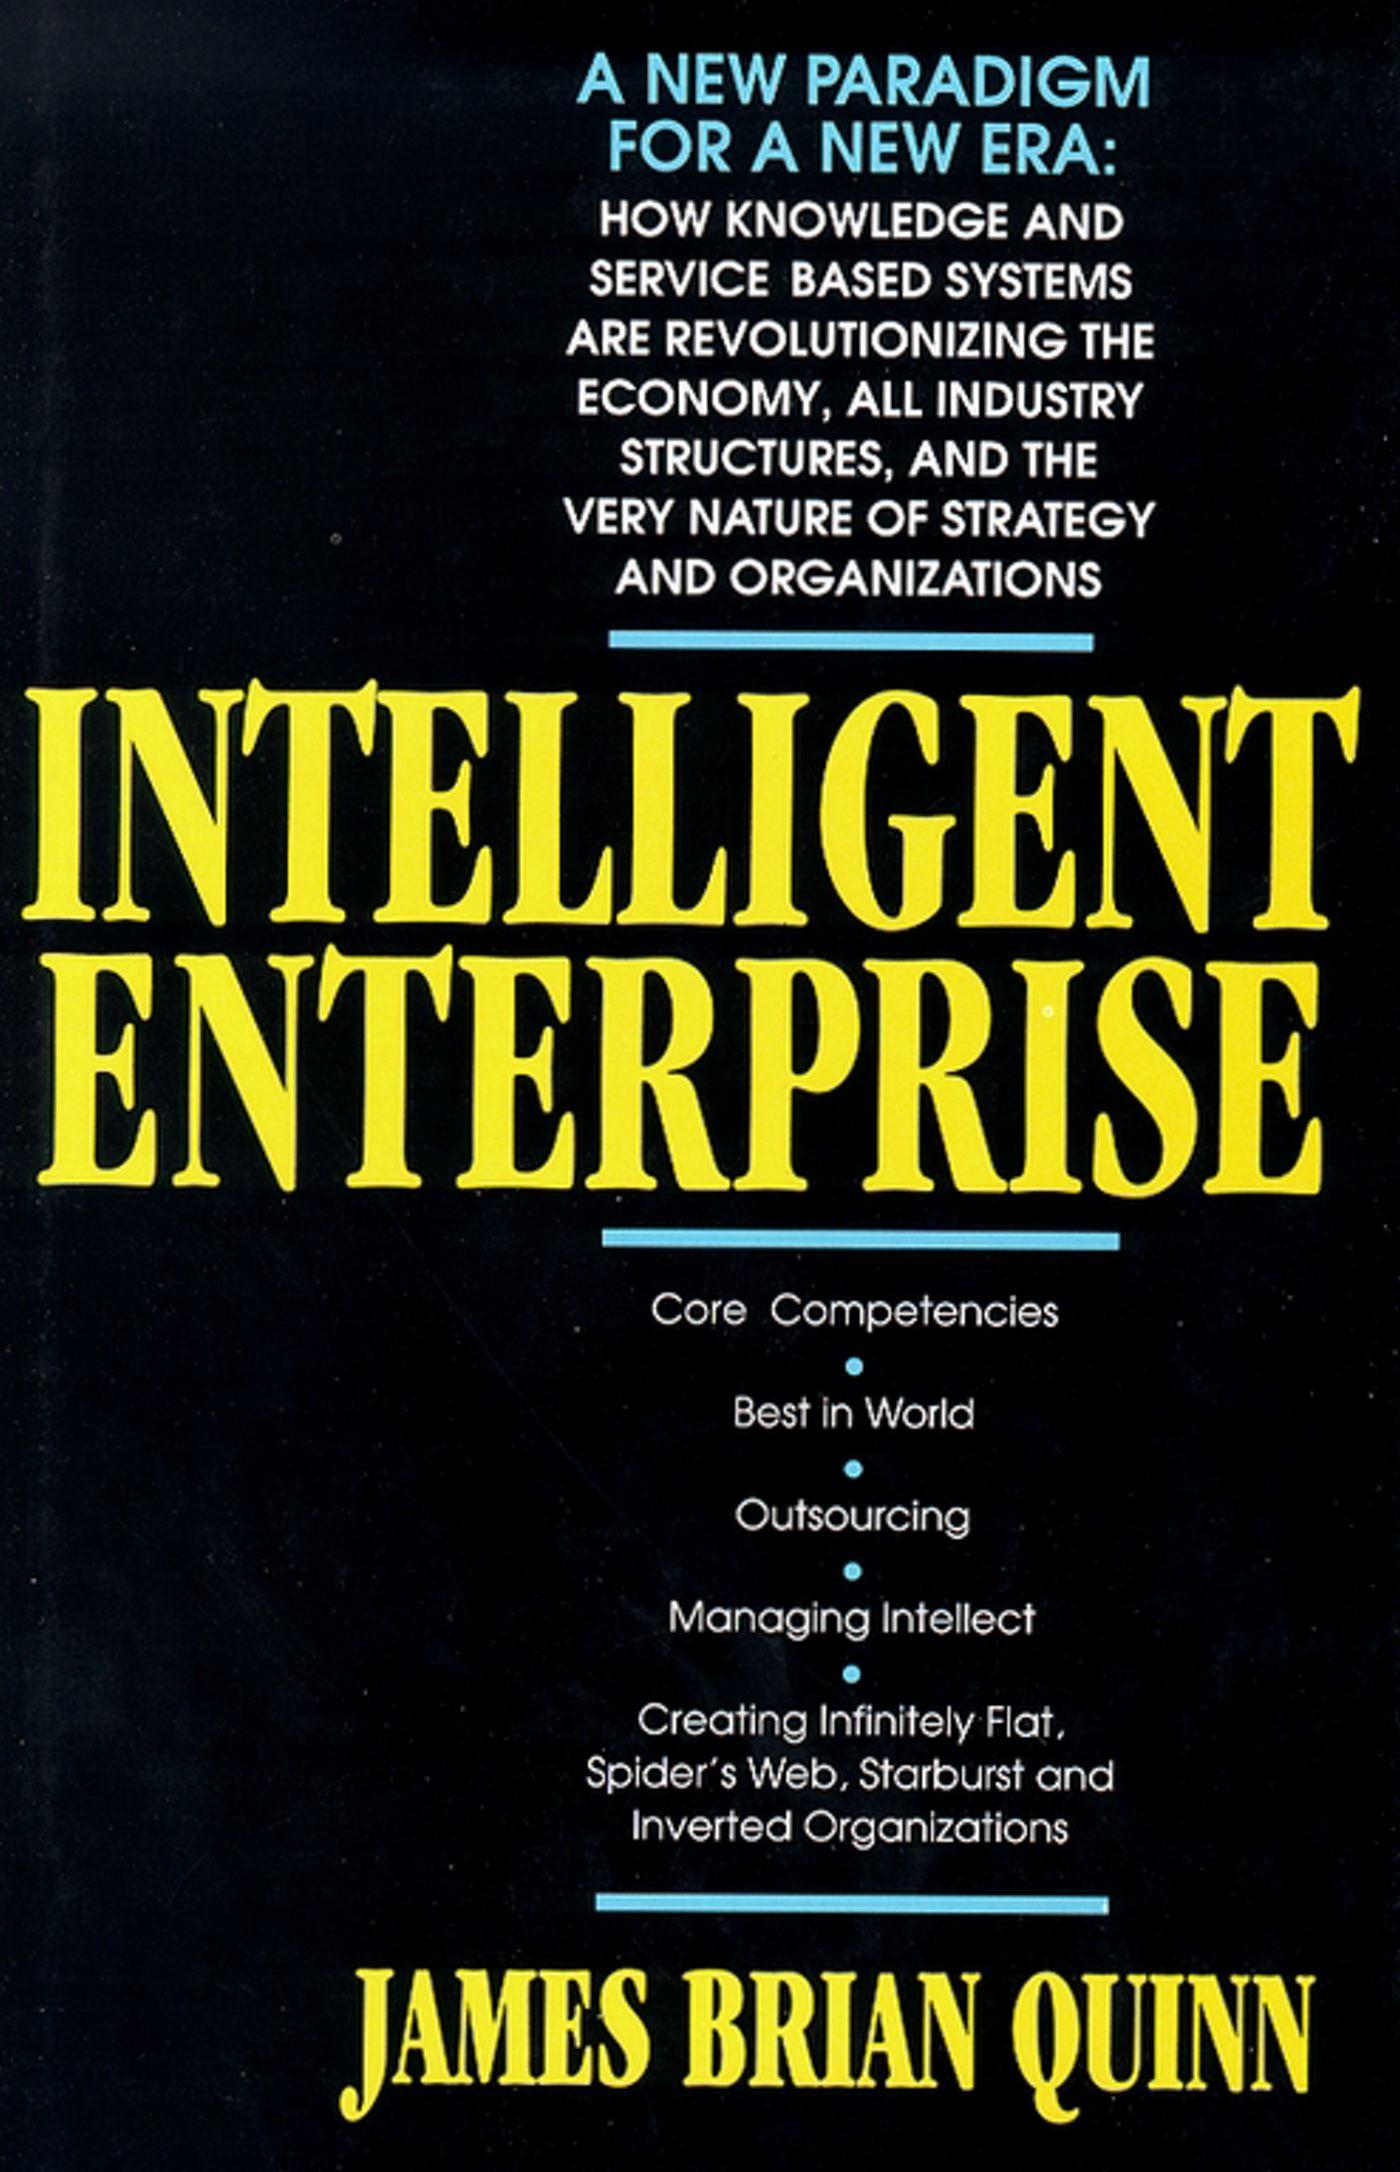 Intelligent enterprise ebook by james brian quinn official cvr9781439105702 9781439105702 hr fandeluxe Choice Image